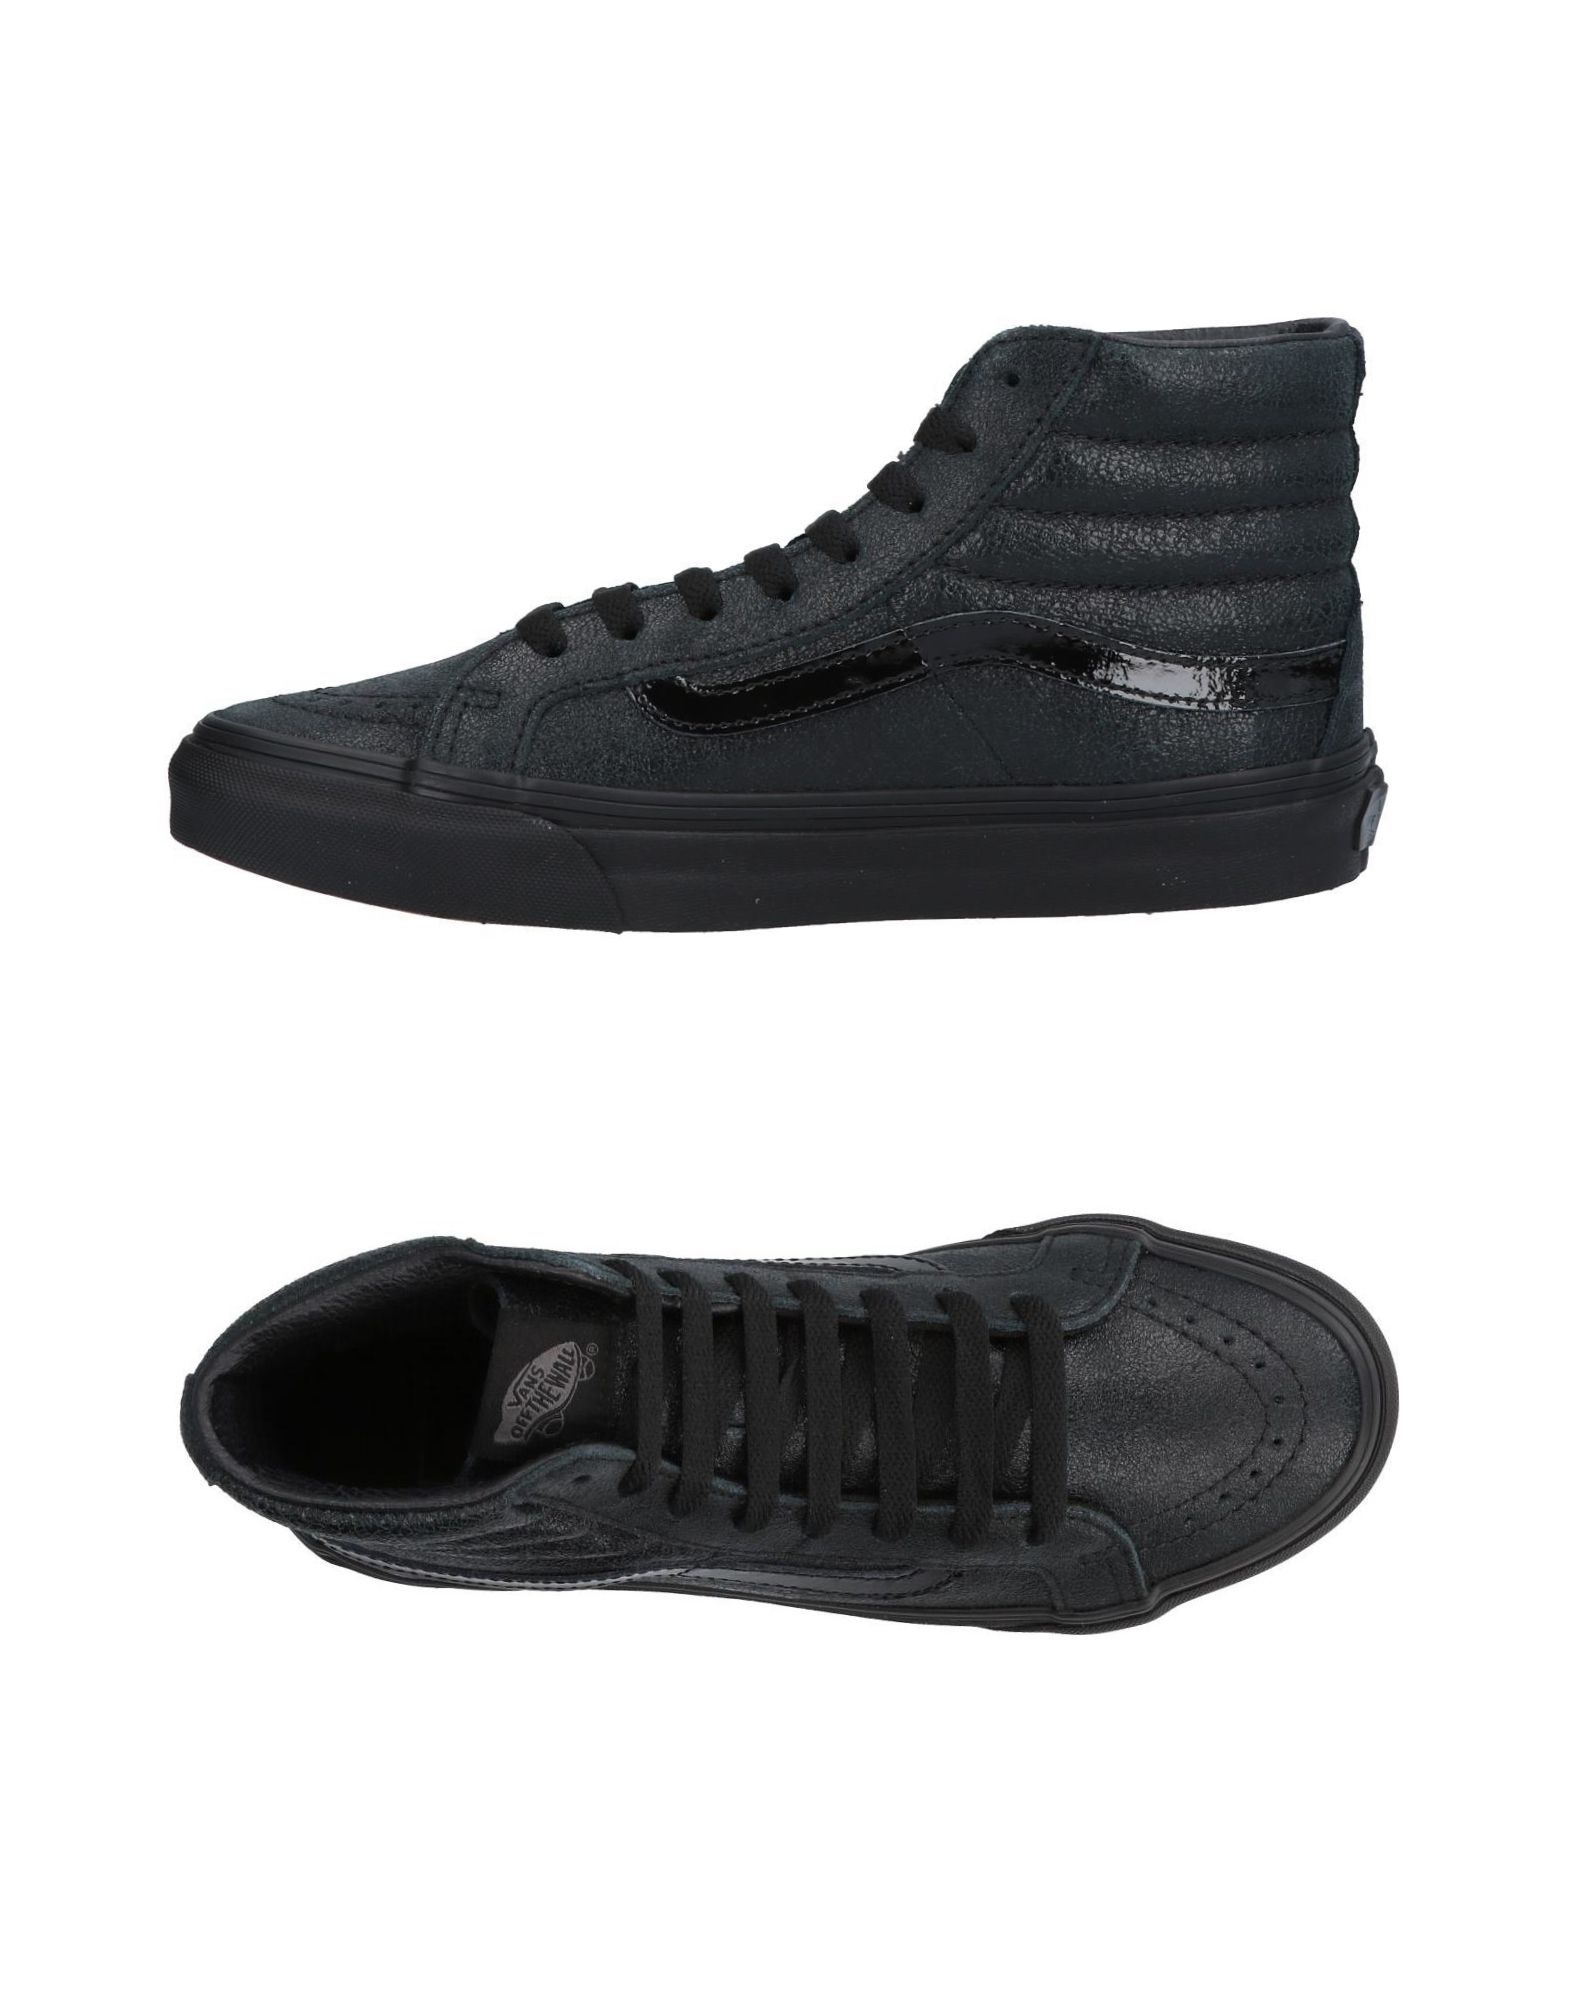 Vans Sneakers Damen  11429231GJ Gute Qualität beliebte Schuhe